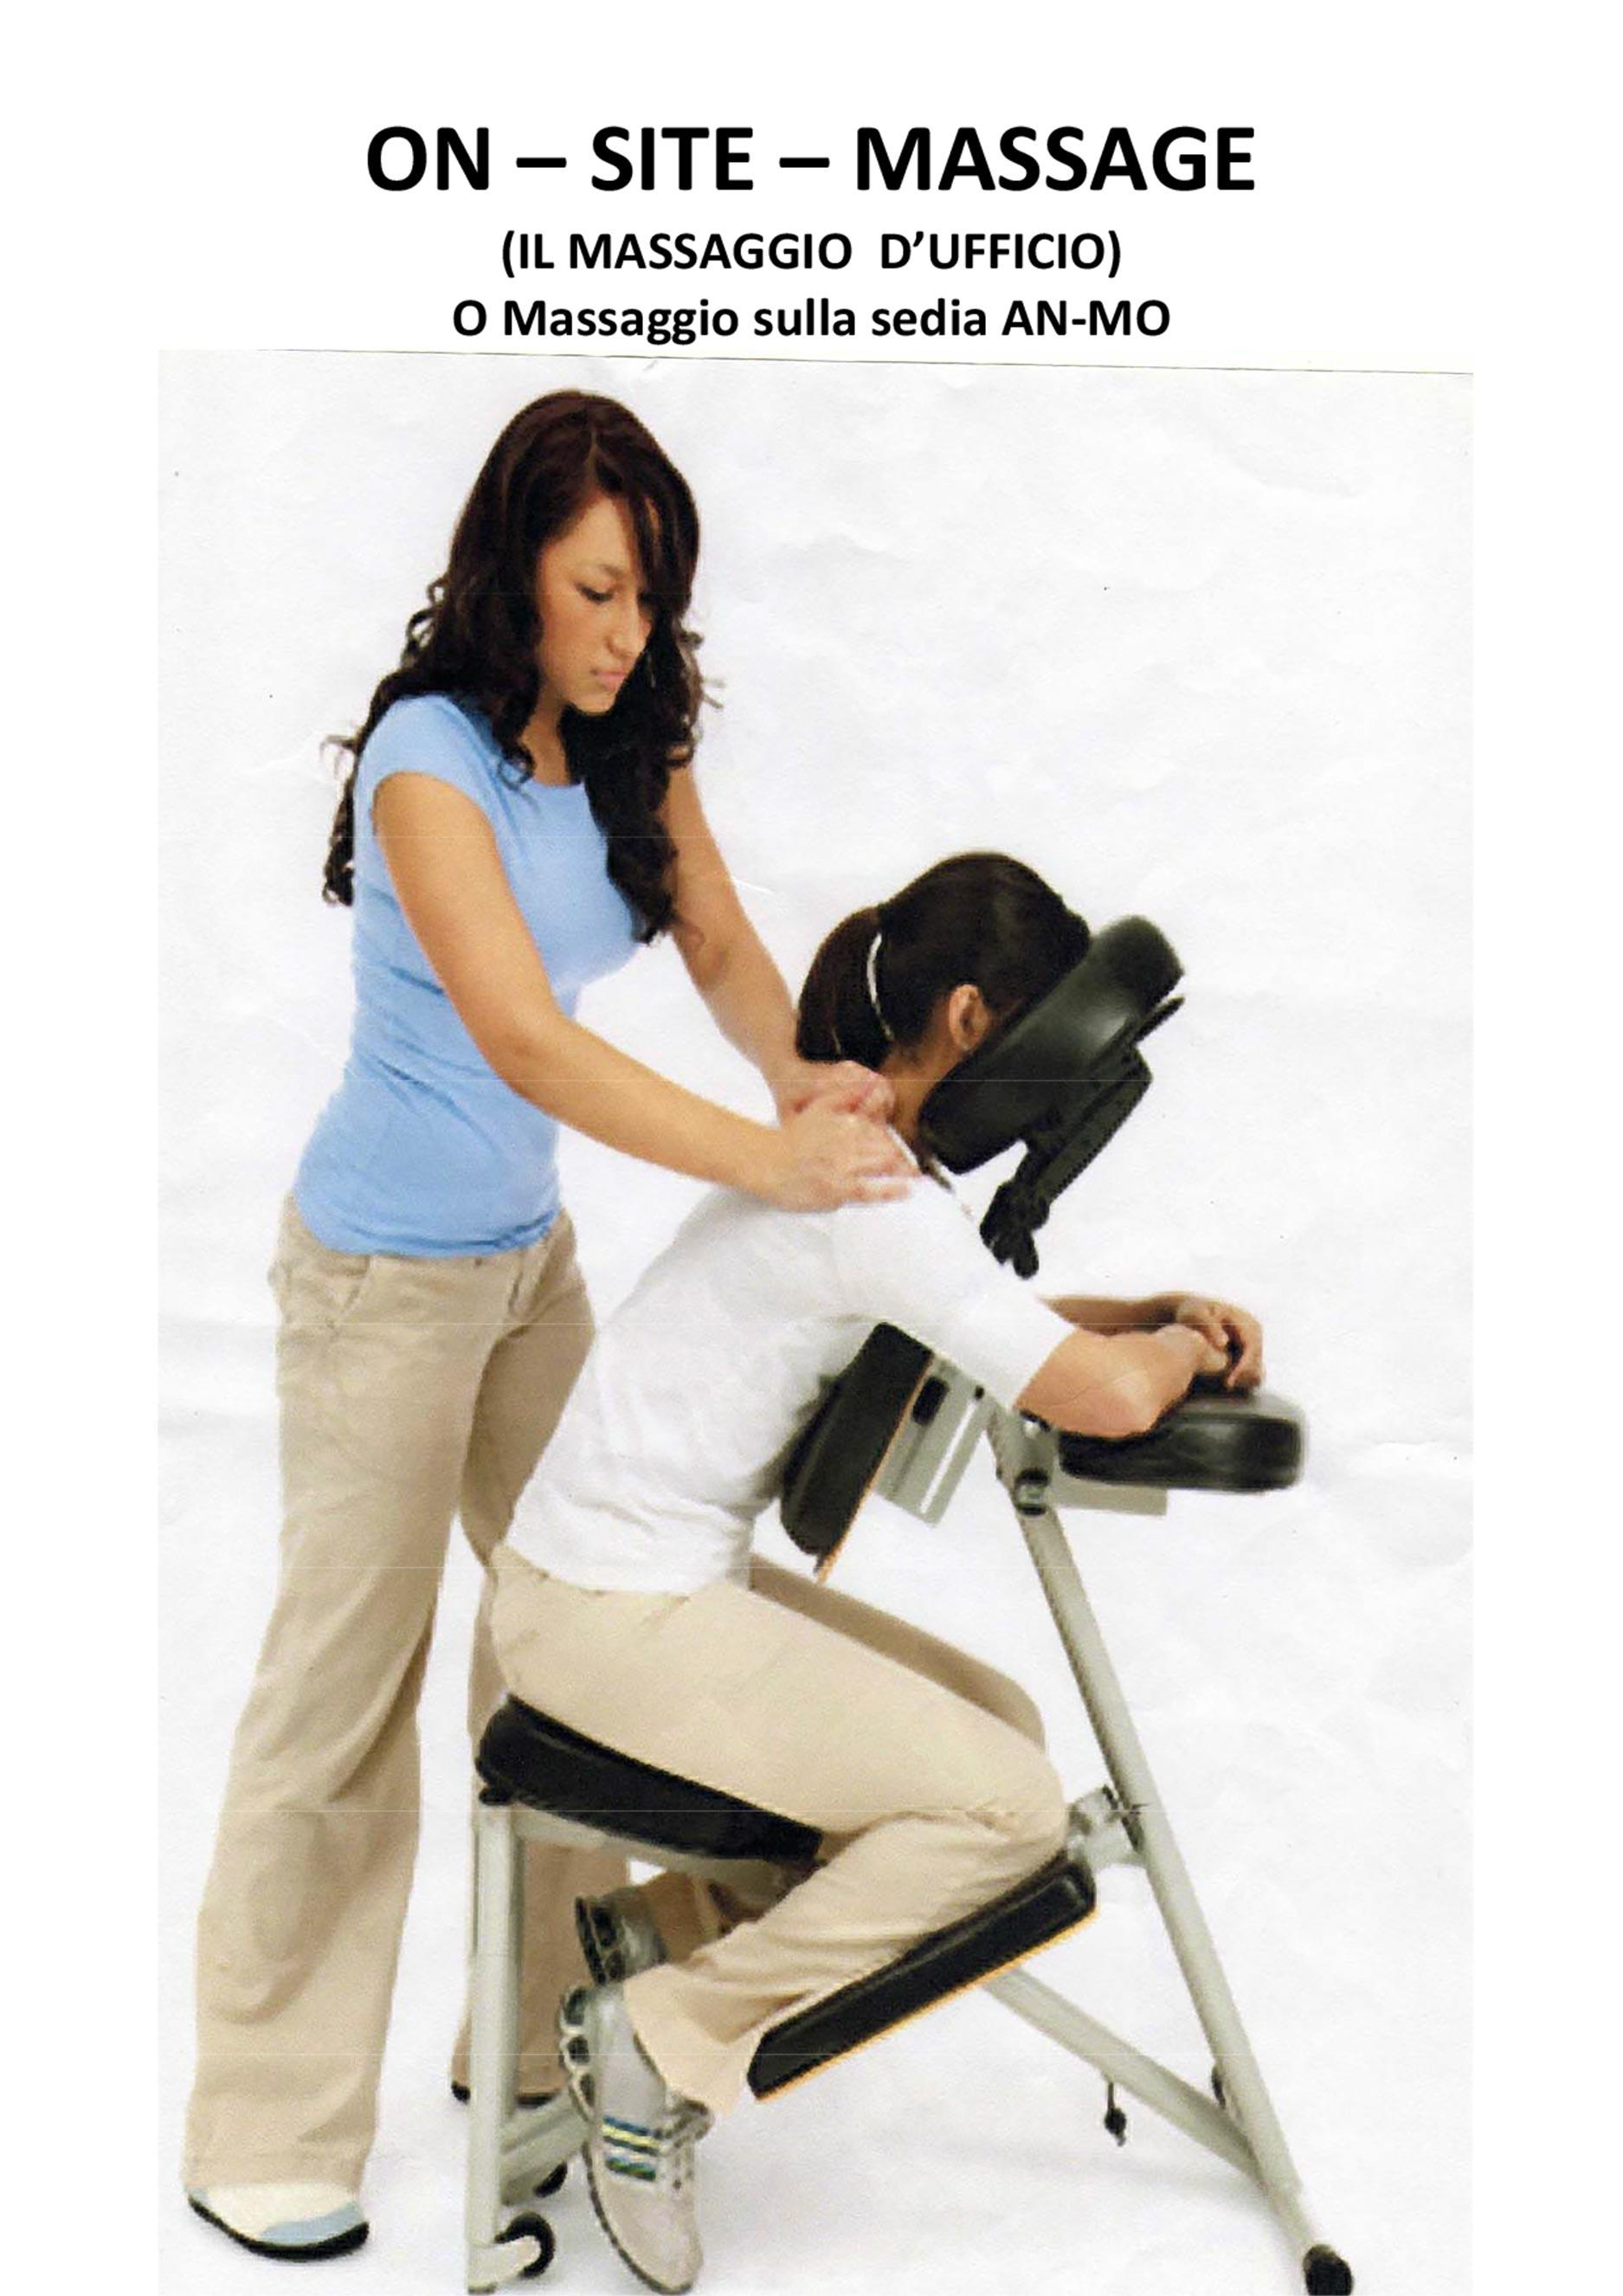 On site massage